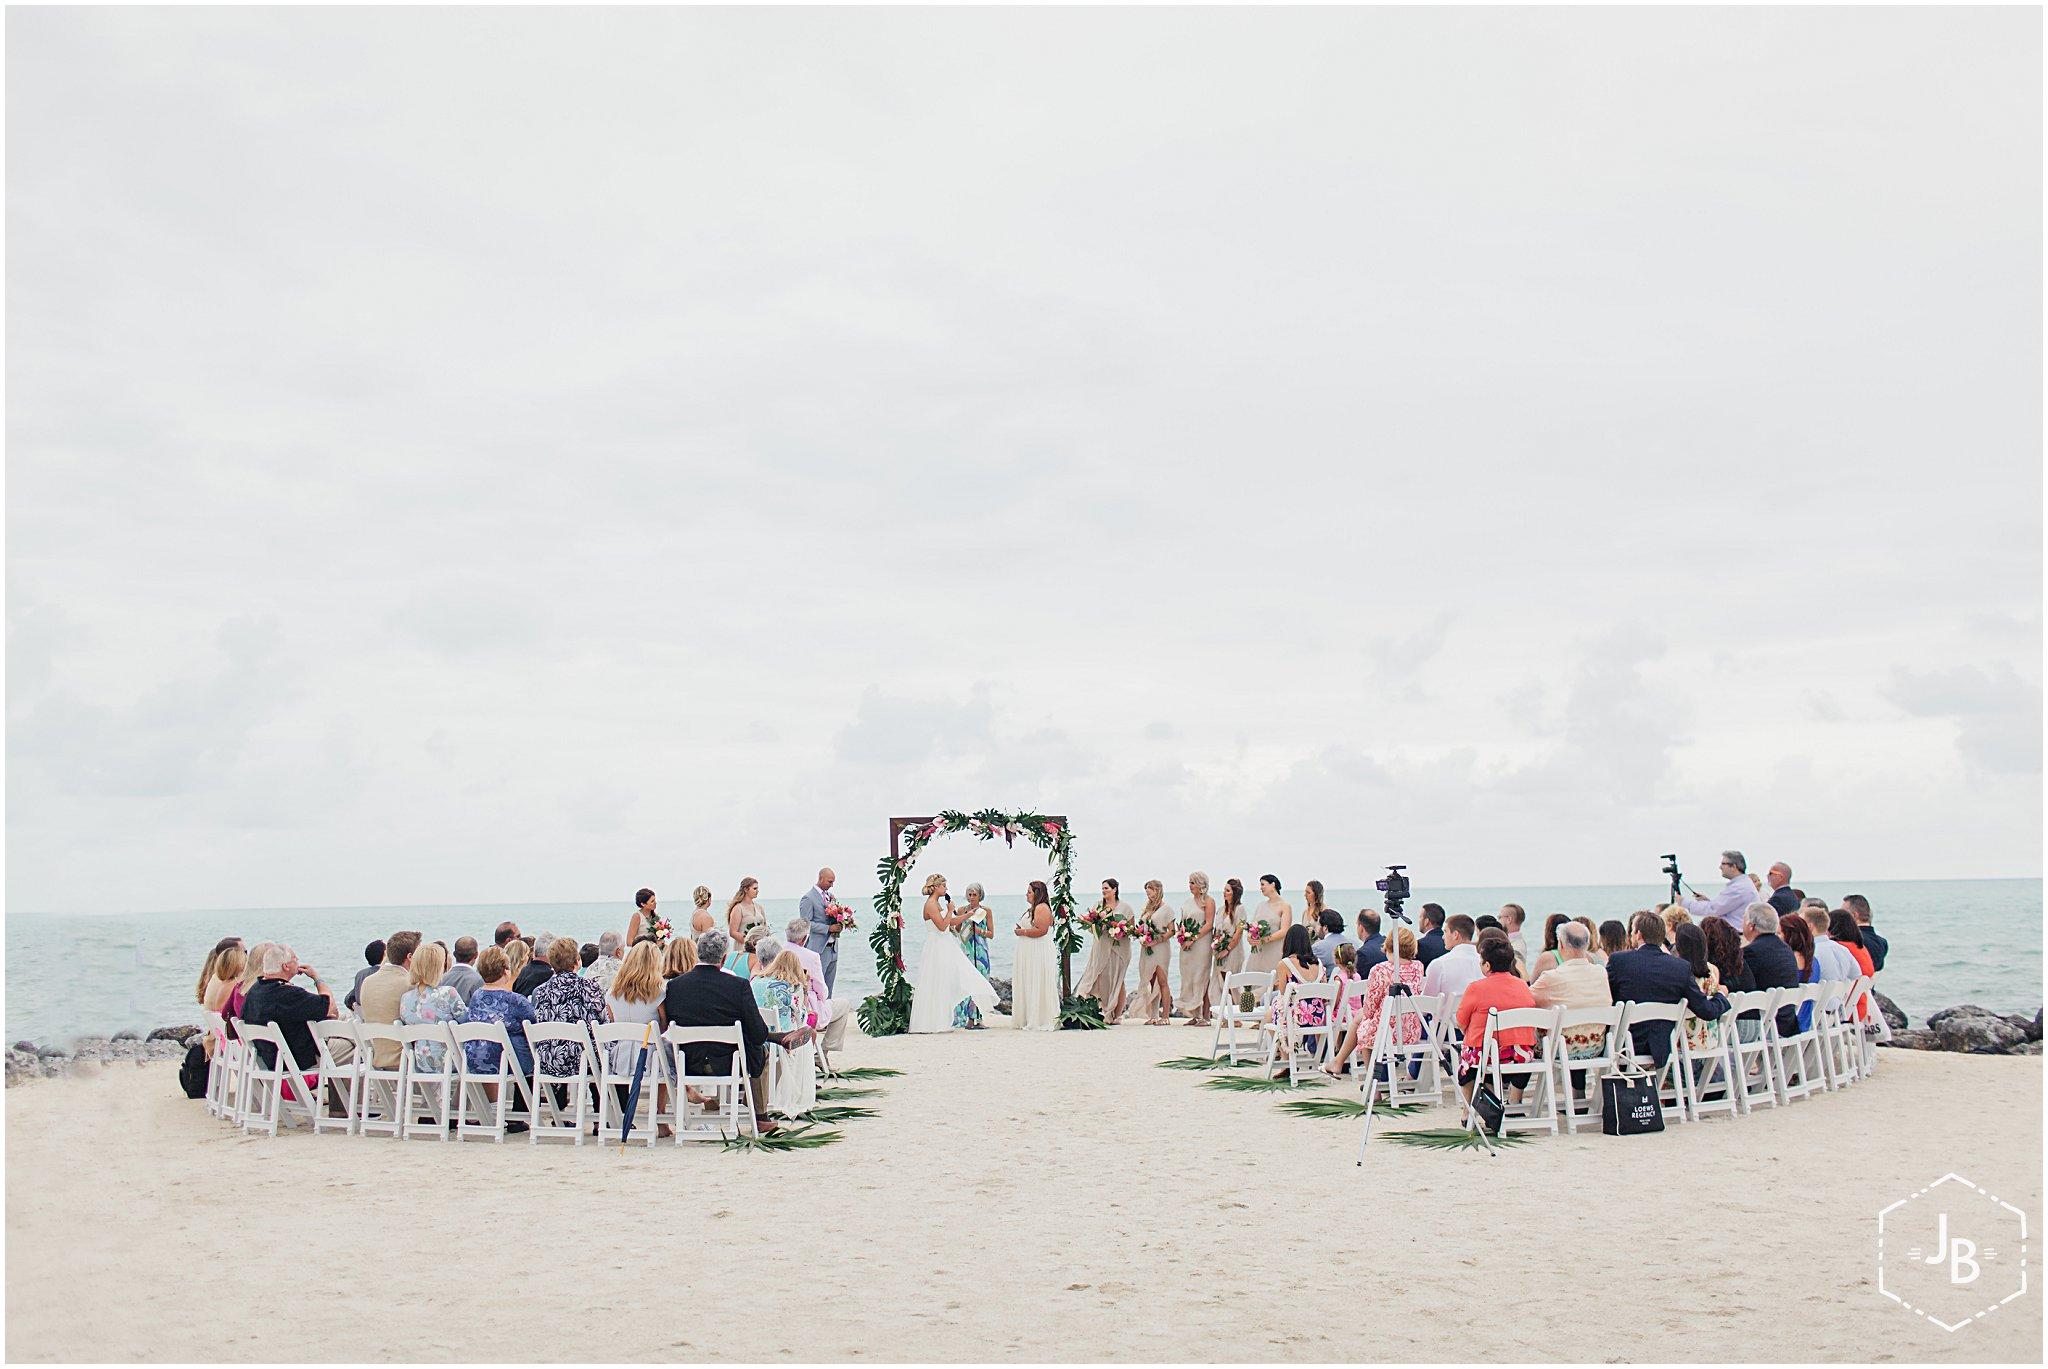 WeddingandEngagementFloridaPhotographer_1477.jpg